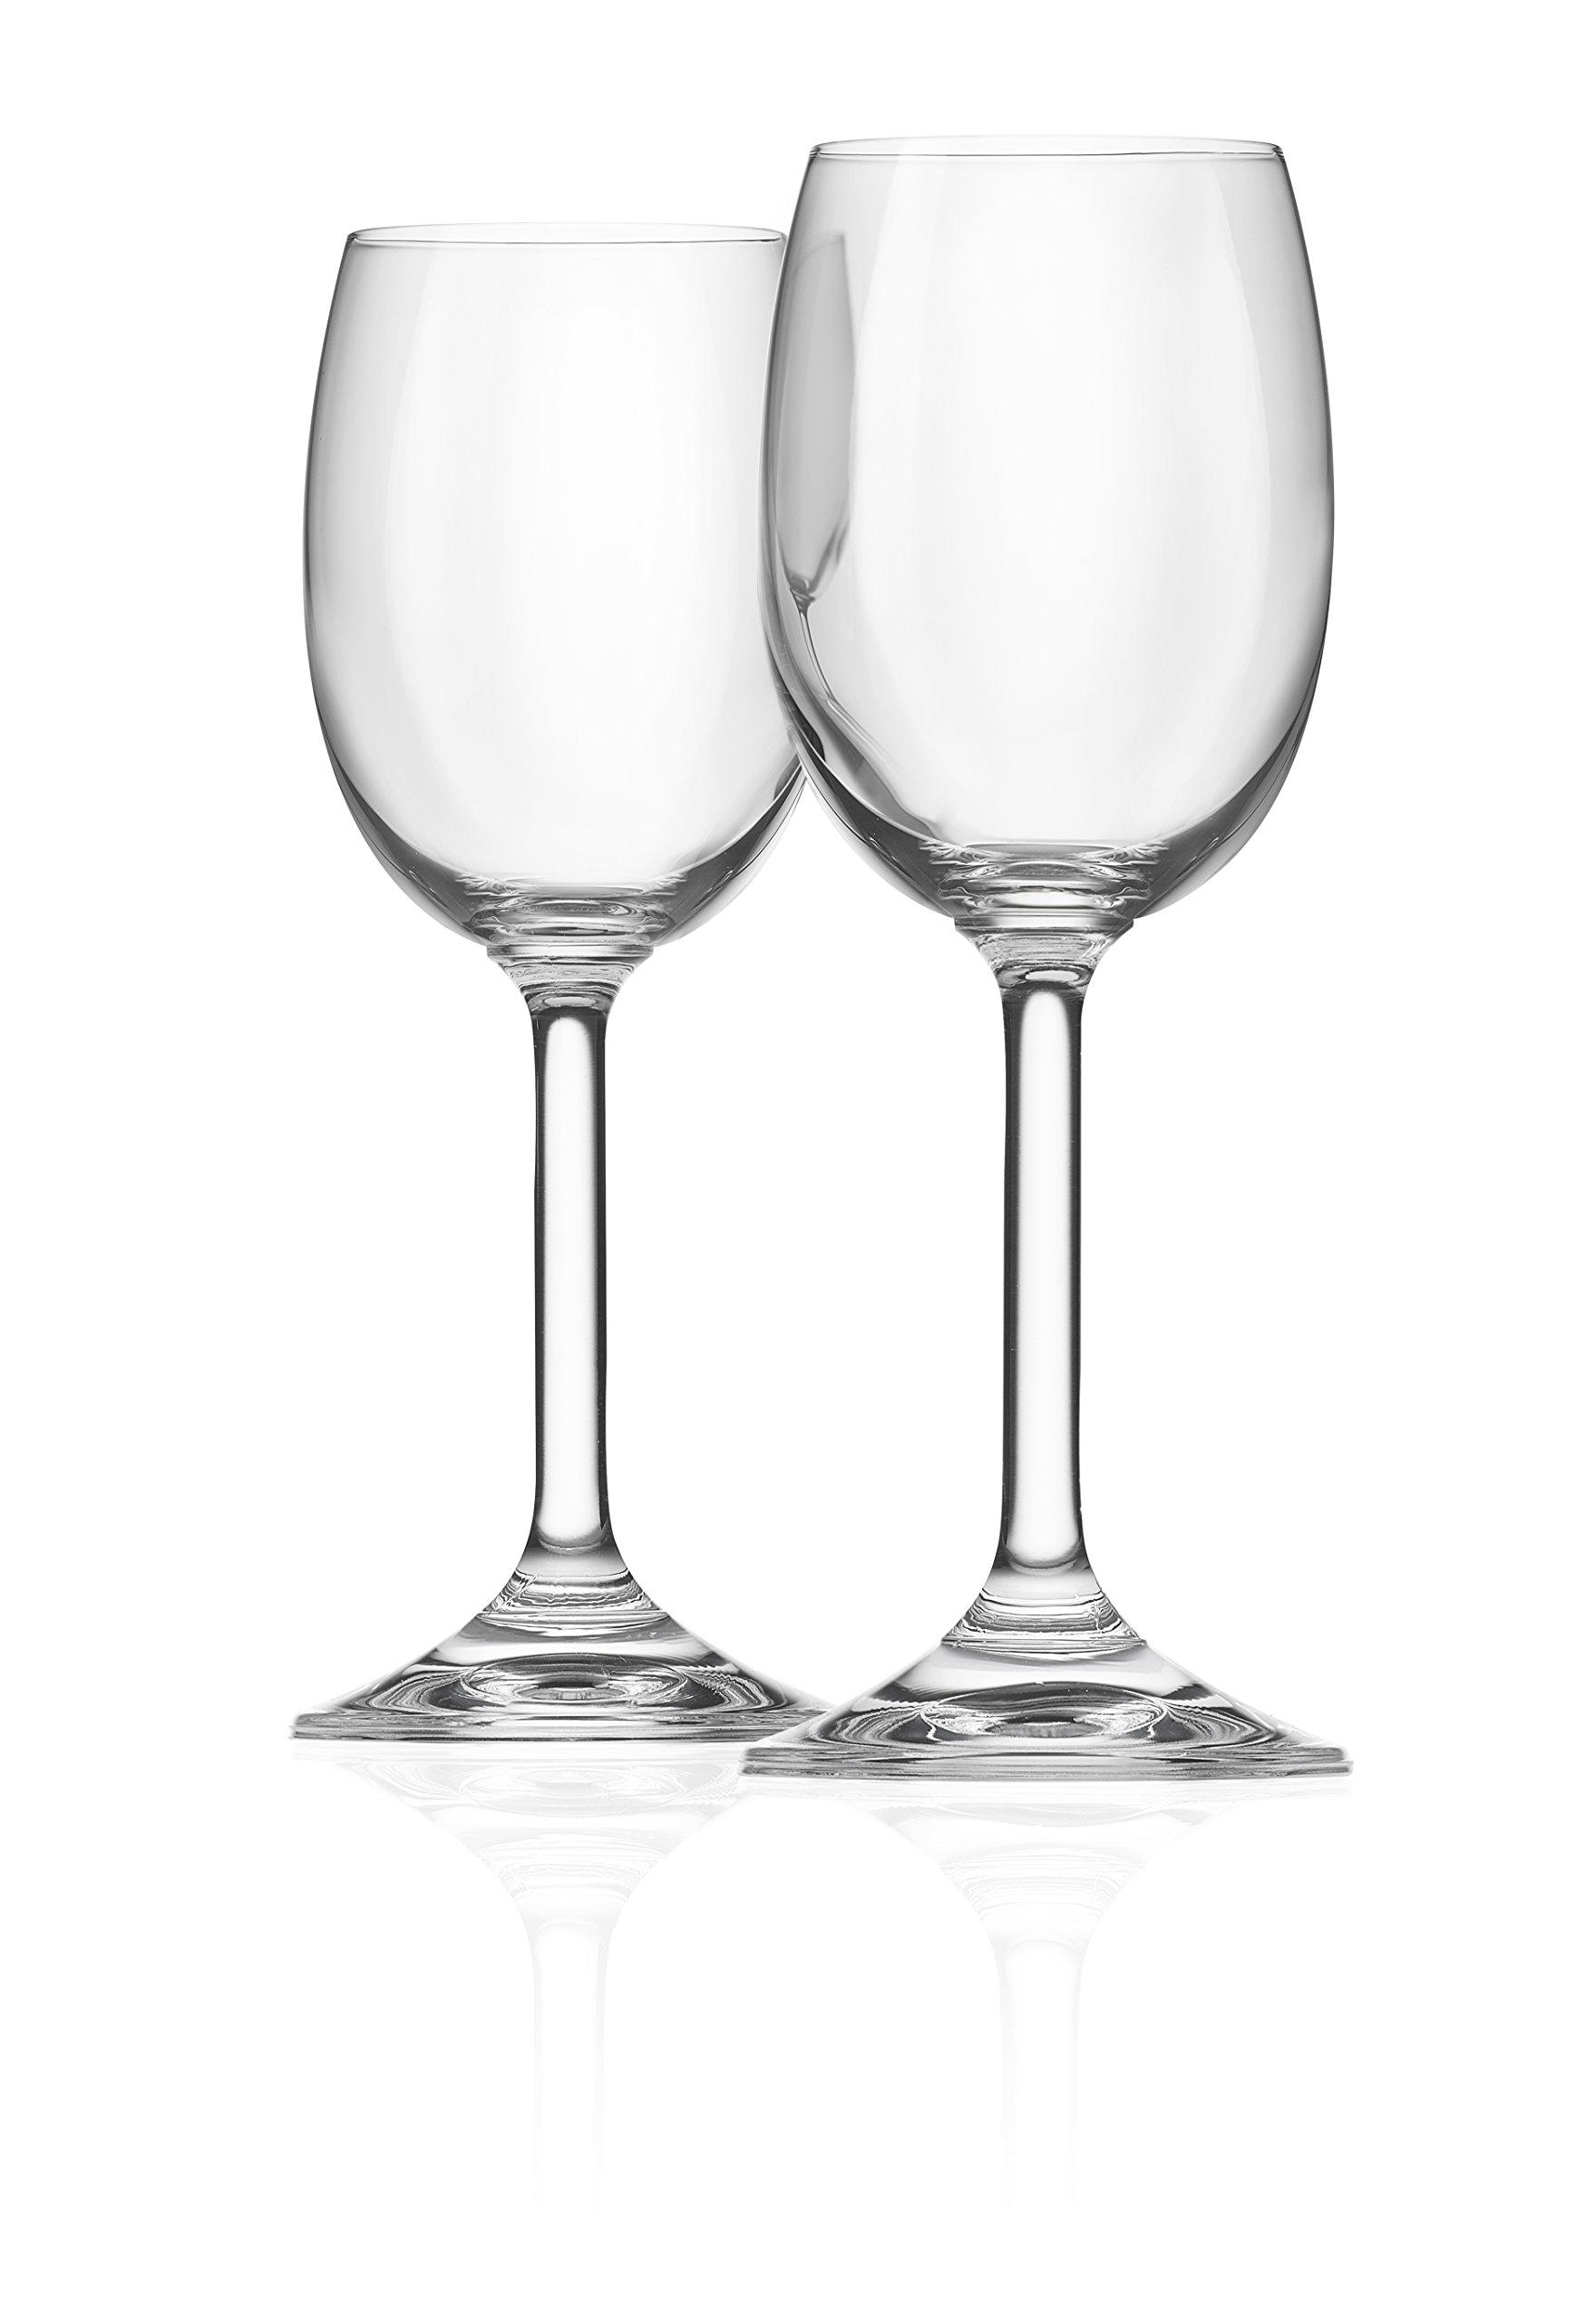 RONA Gala Sherry Glass, 3 oz, (Set of 6)